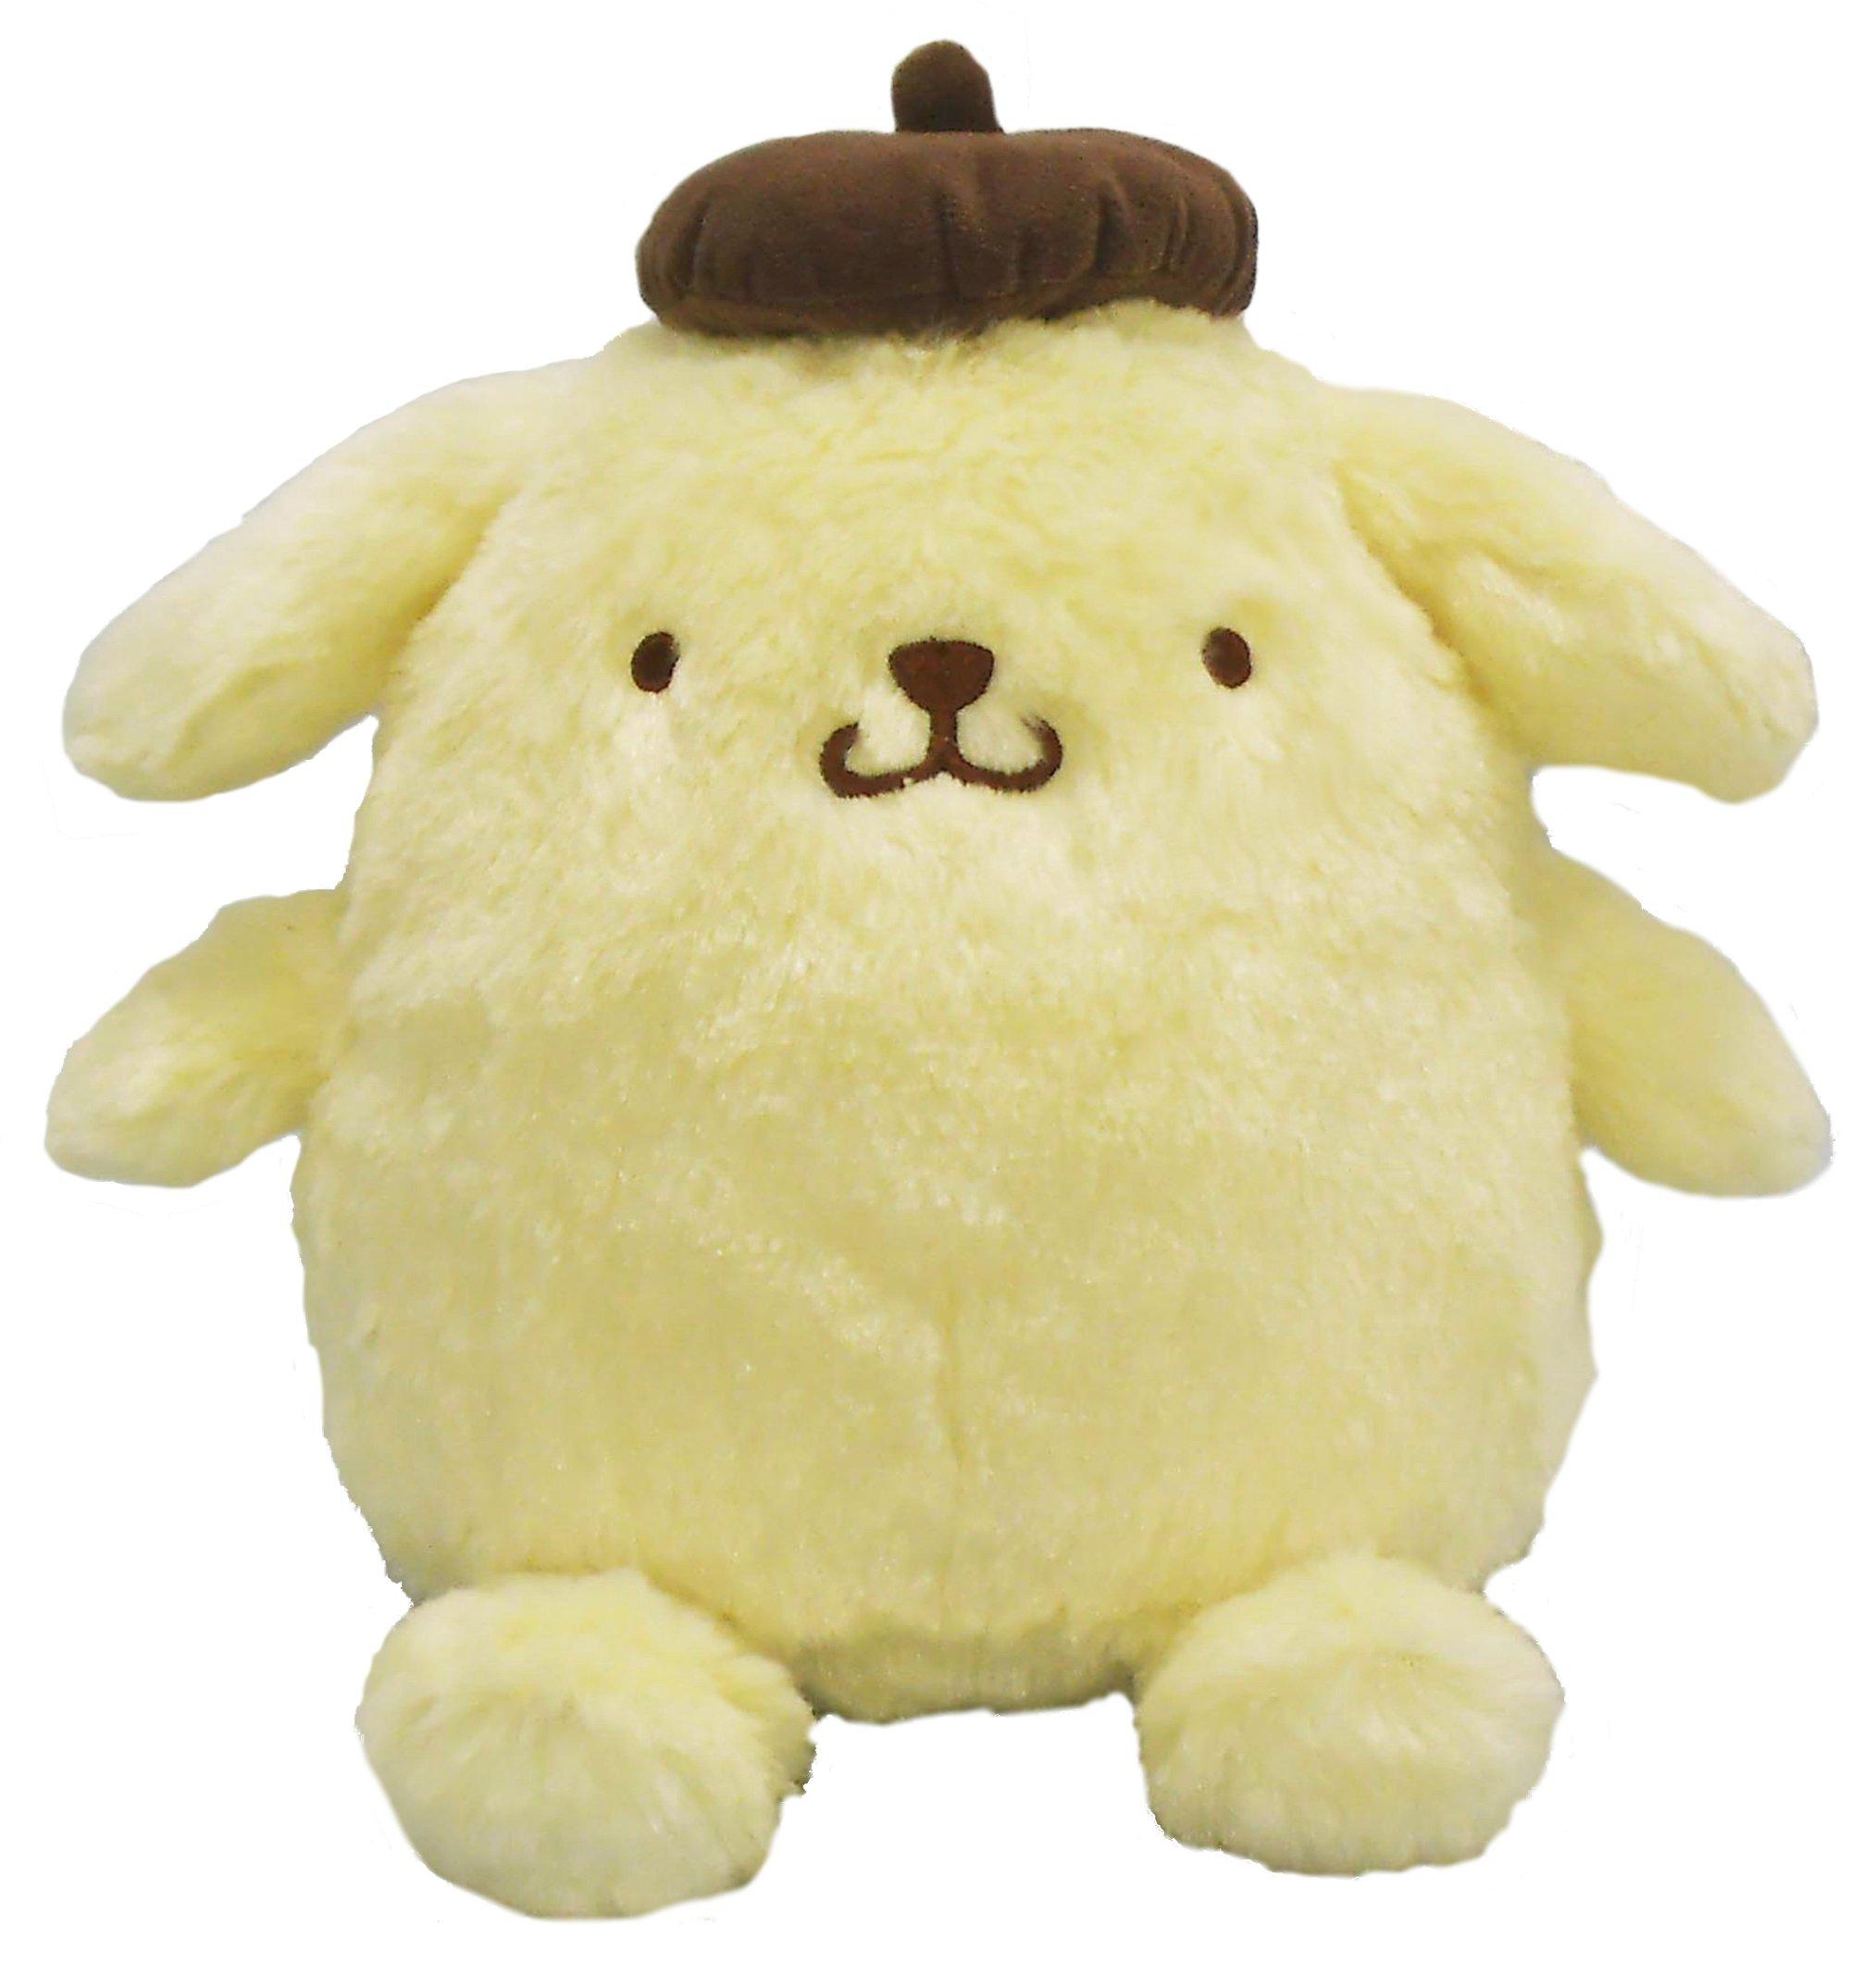 Sanrio Hug Hug a stuffed toy series M Pom Pom Purin sitting height 26cm by Nakajima (Image #1)